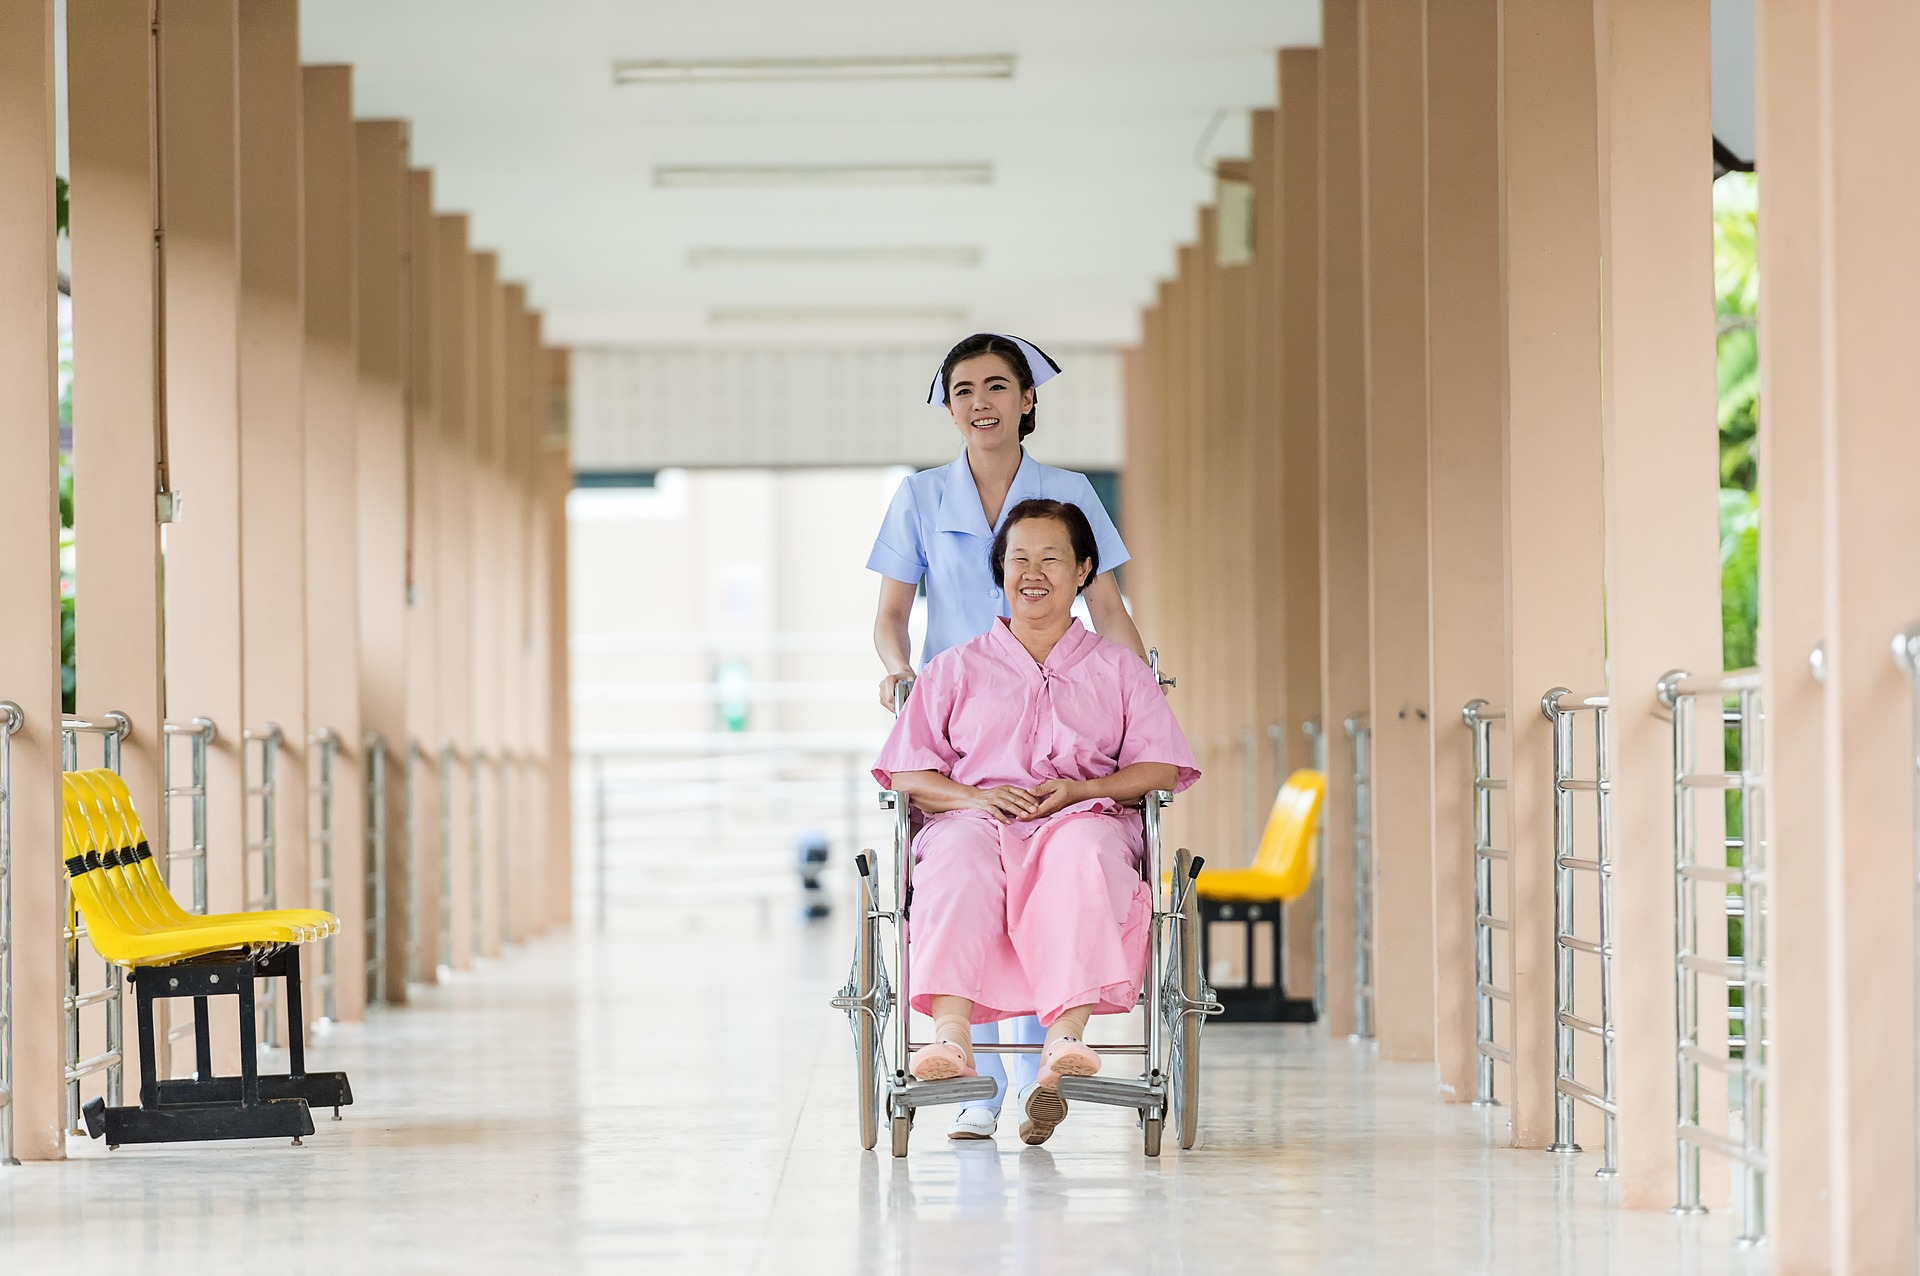 Nursing Care Jobs in Japan